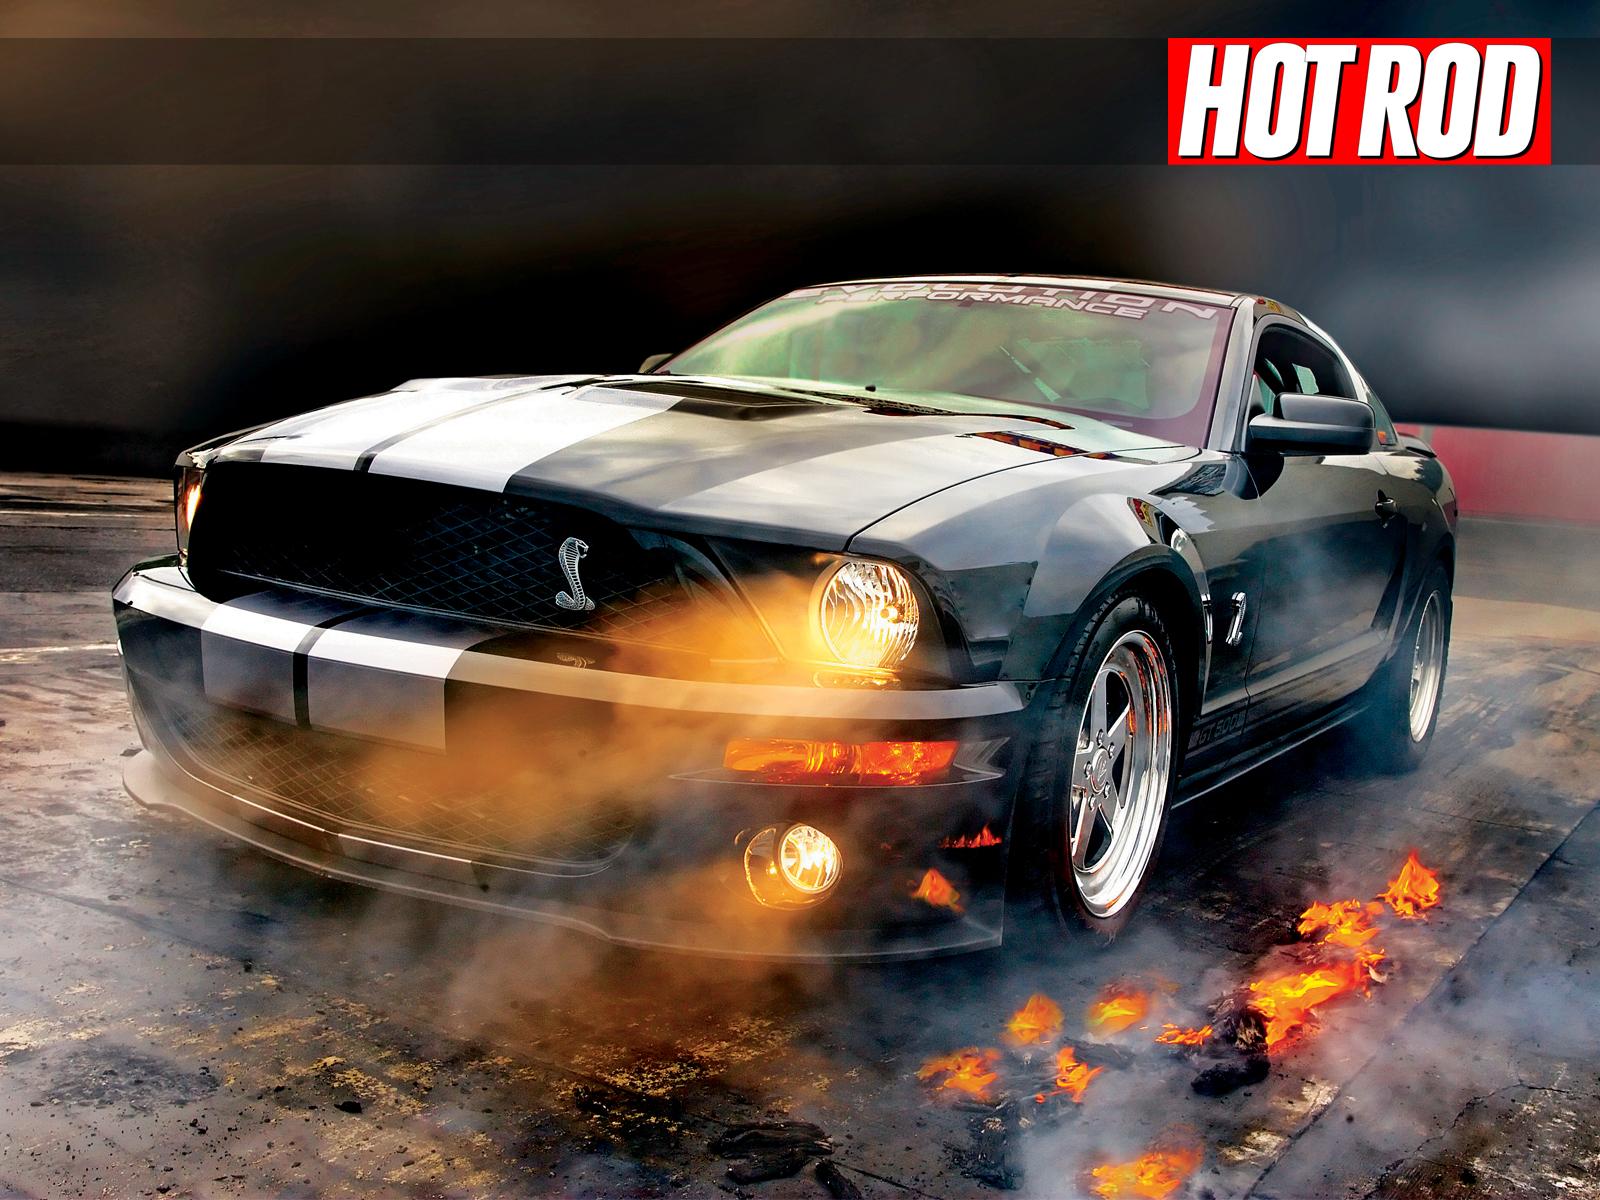 black hot cars wallpaper 6 desktop wallpaper - hdblackwallpaper